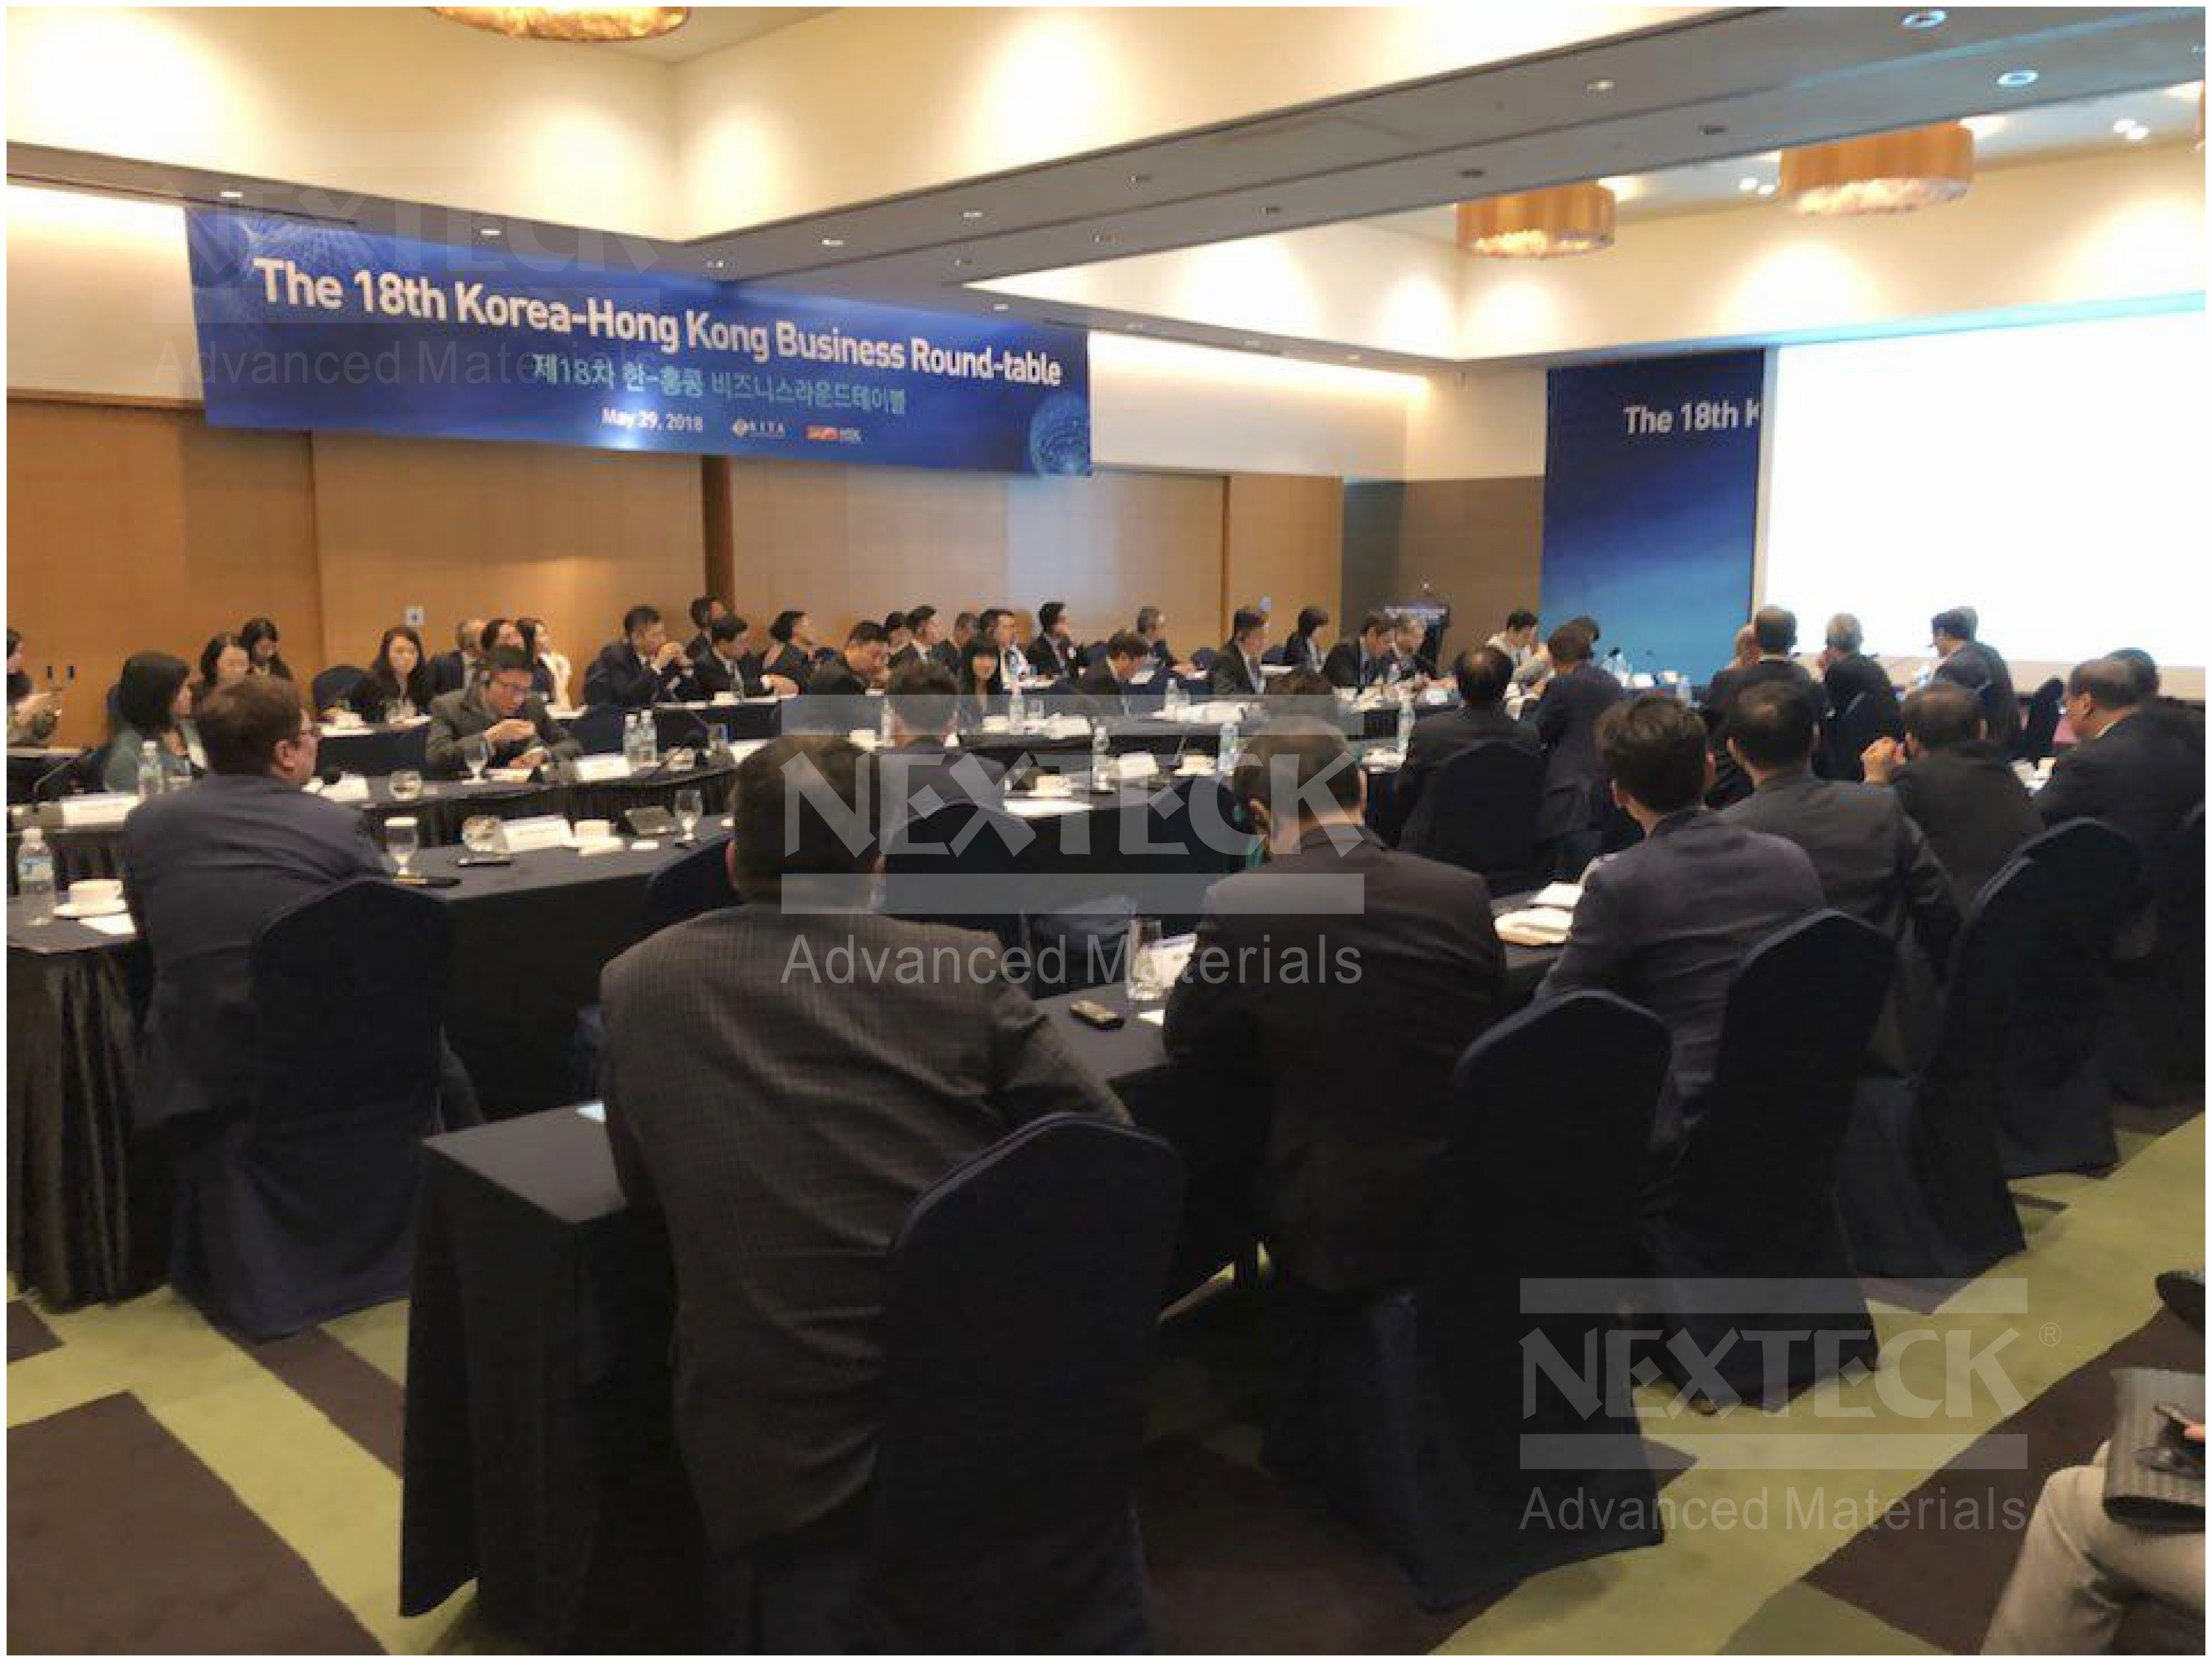 NEXTECK集团参加2018年韩国及香港各大商会工业创新圆桌会议!